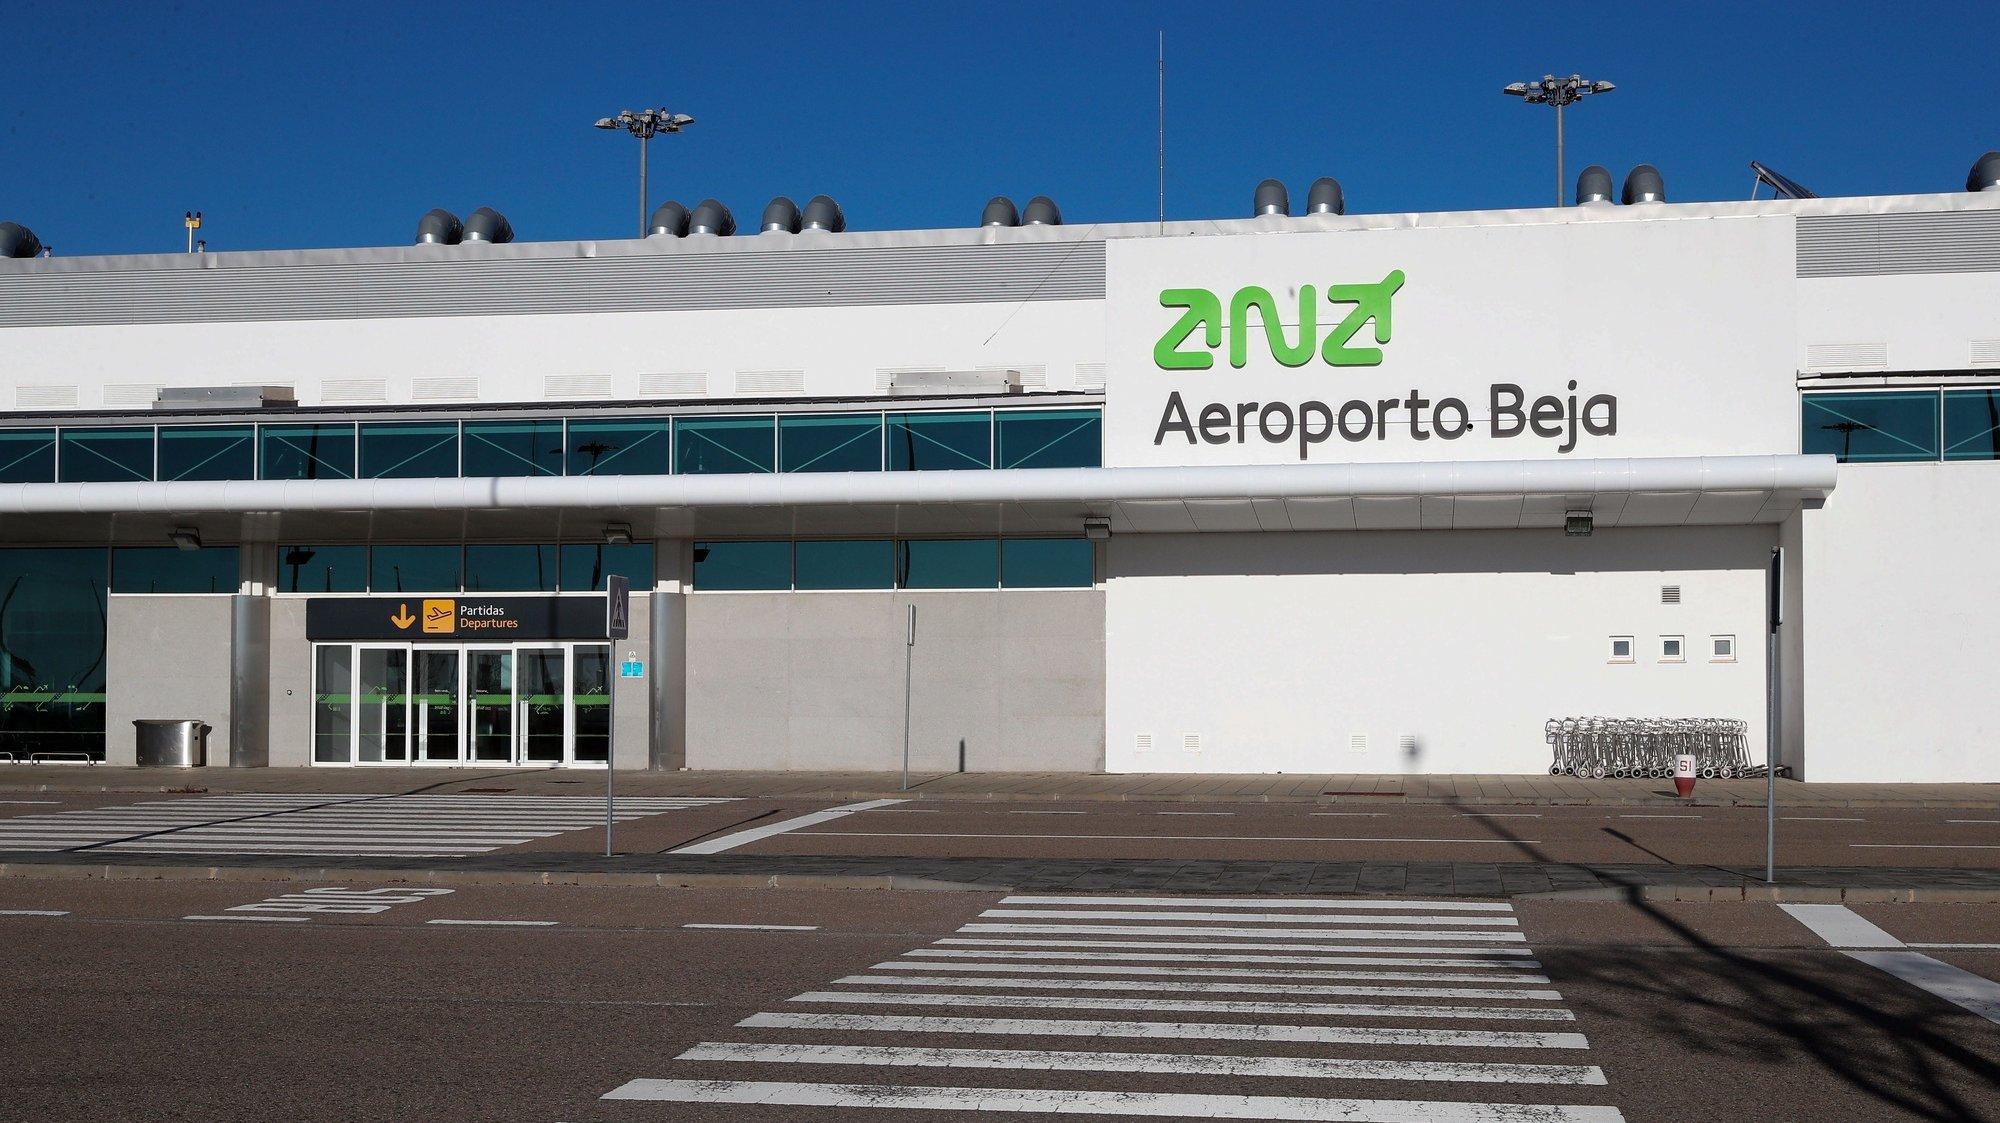 Terminal do Aeroporto de Beja, 21 de janeiro de 2021. NUNO VEIGA/LUSA